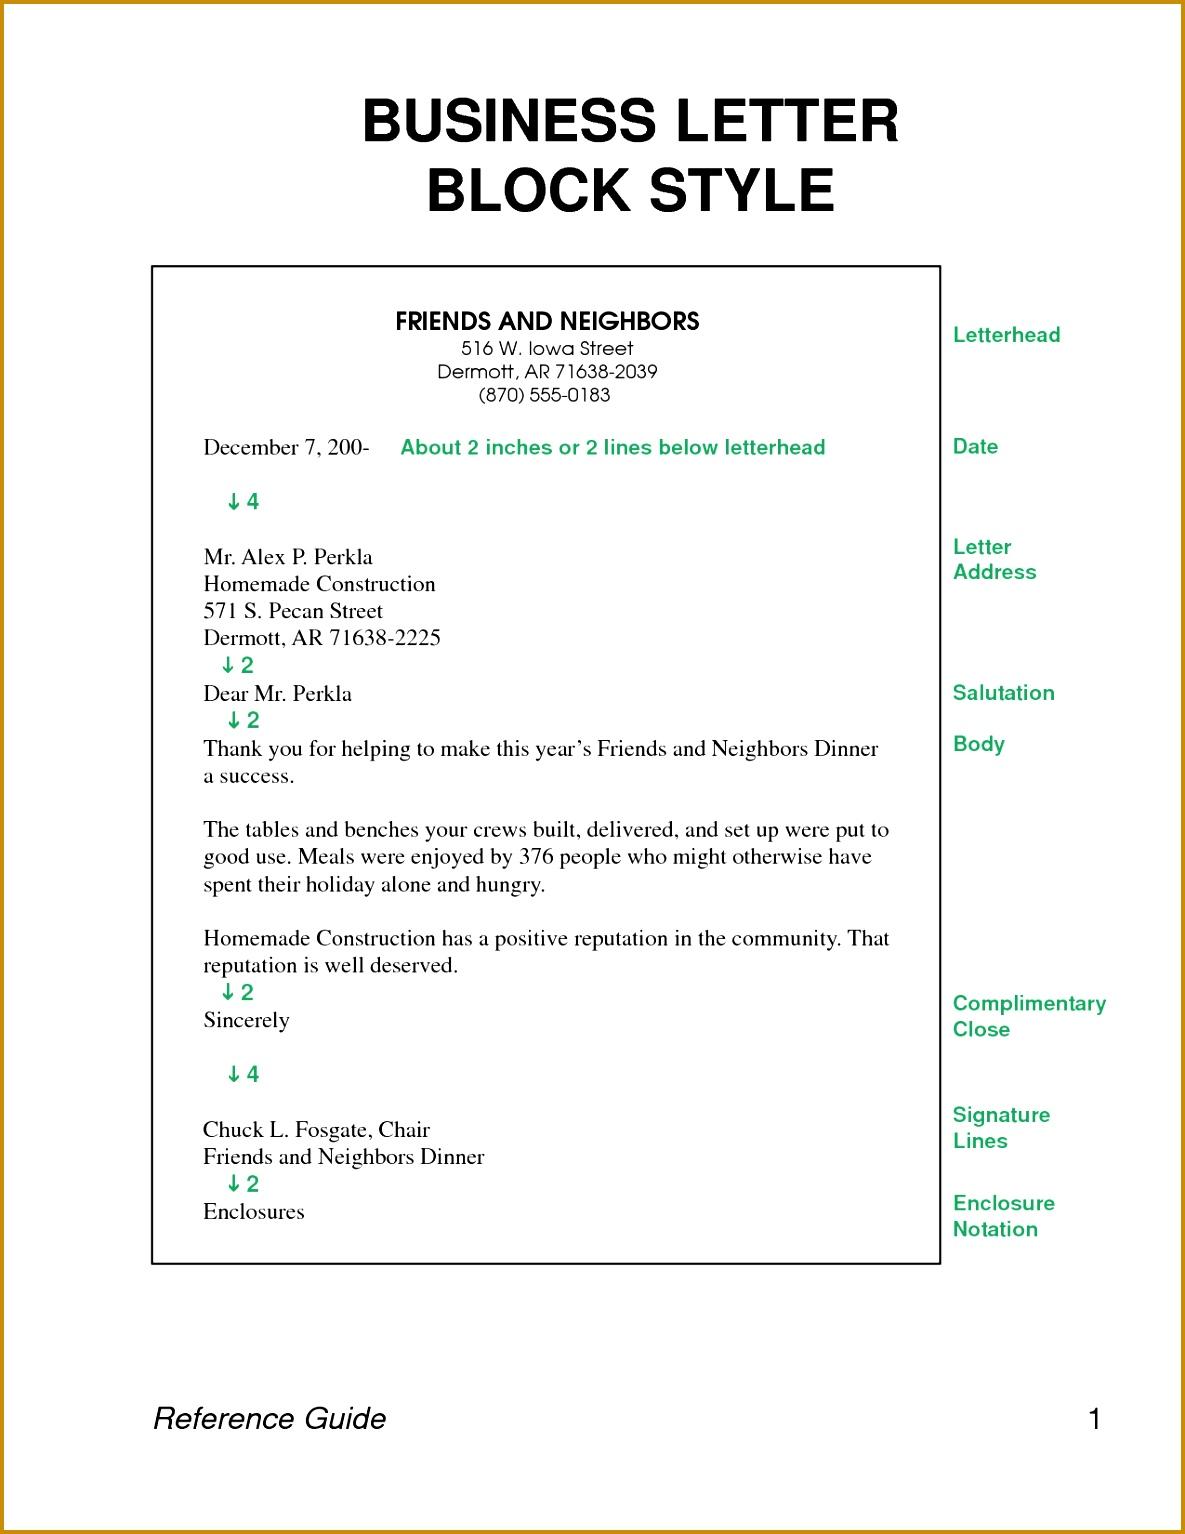 best solutions of thank you letter block style format marvelous block cover letter twentyeandi of thank you letter block style format 15341185